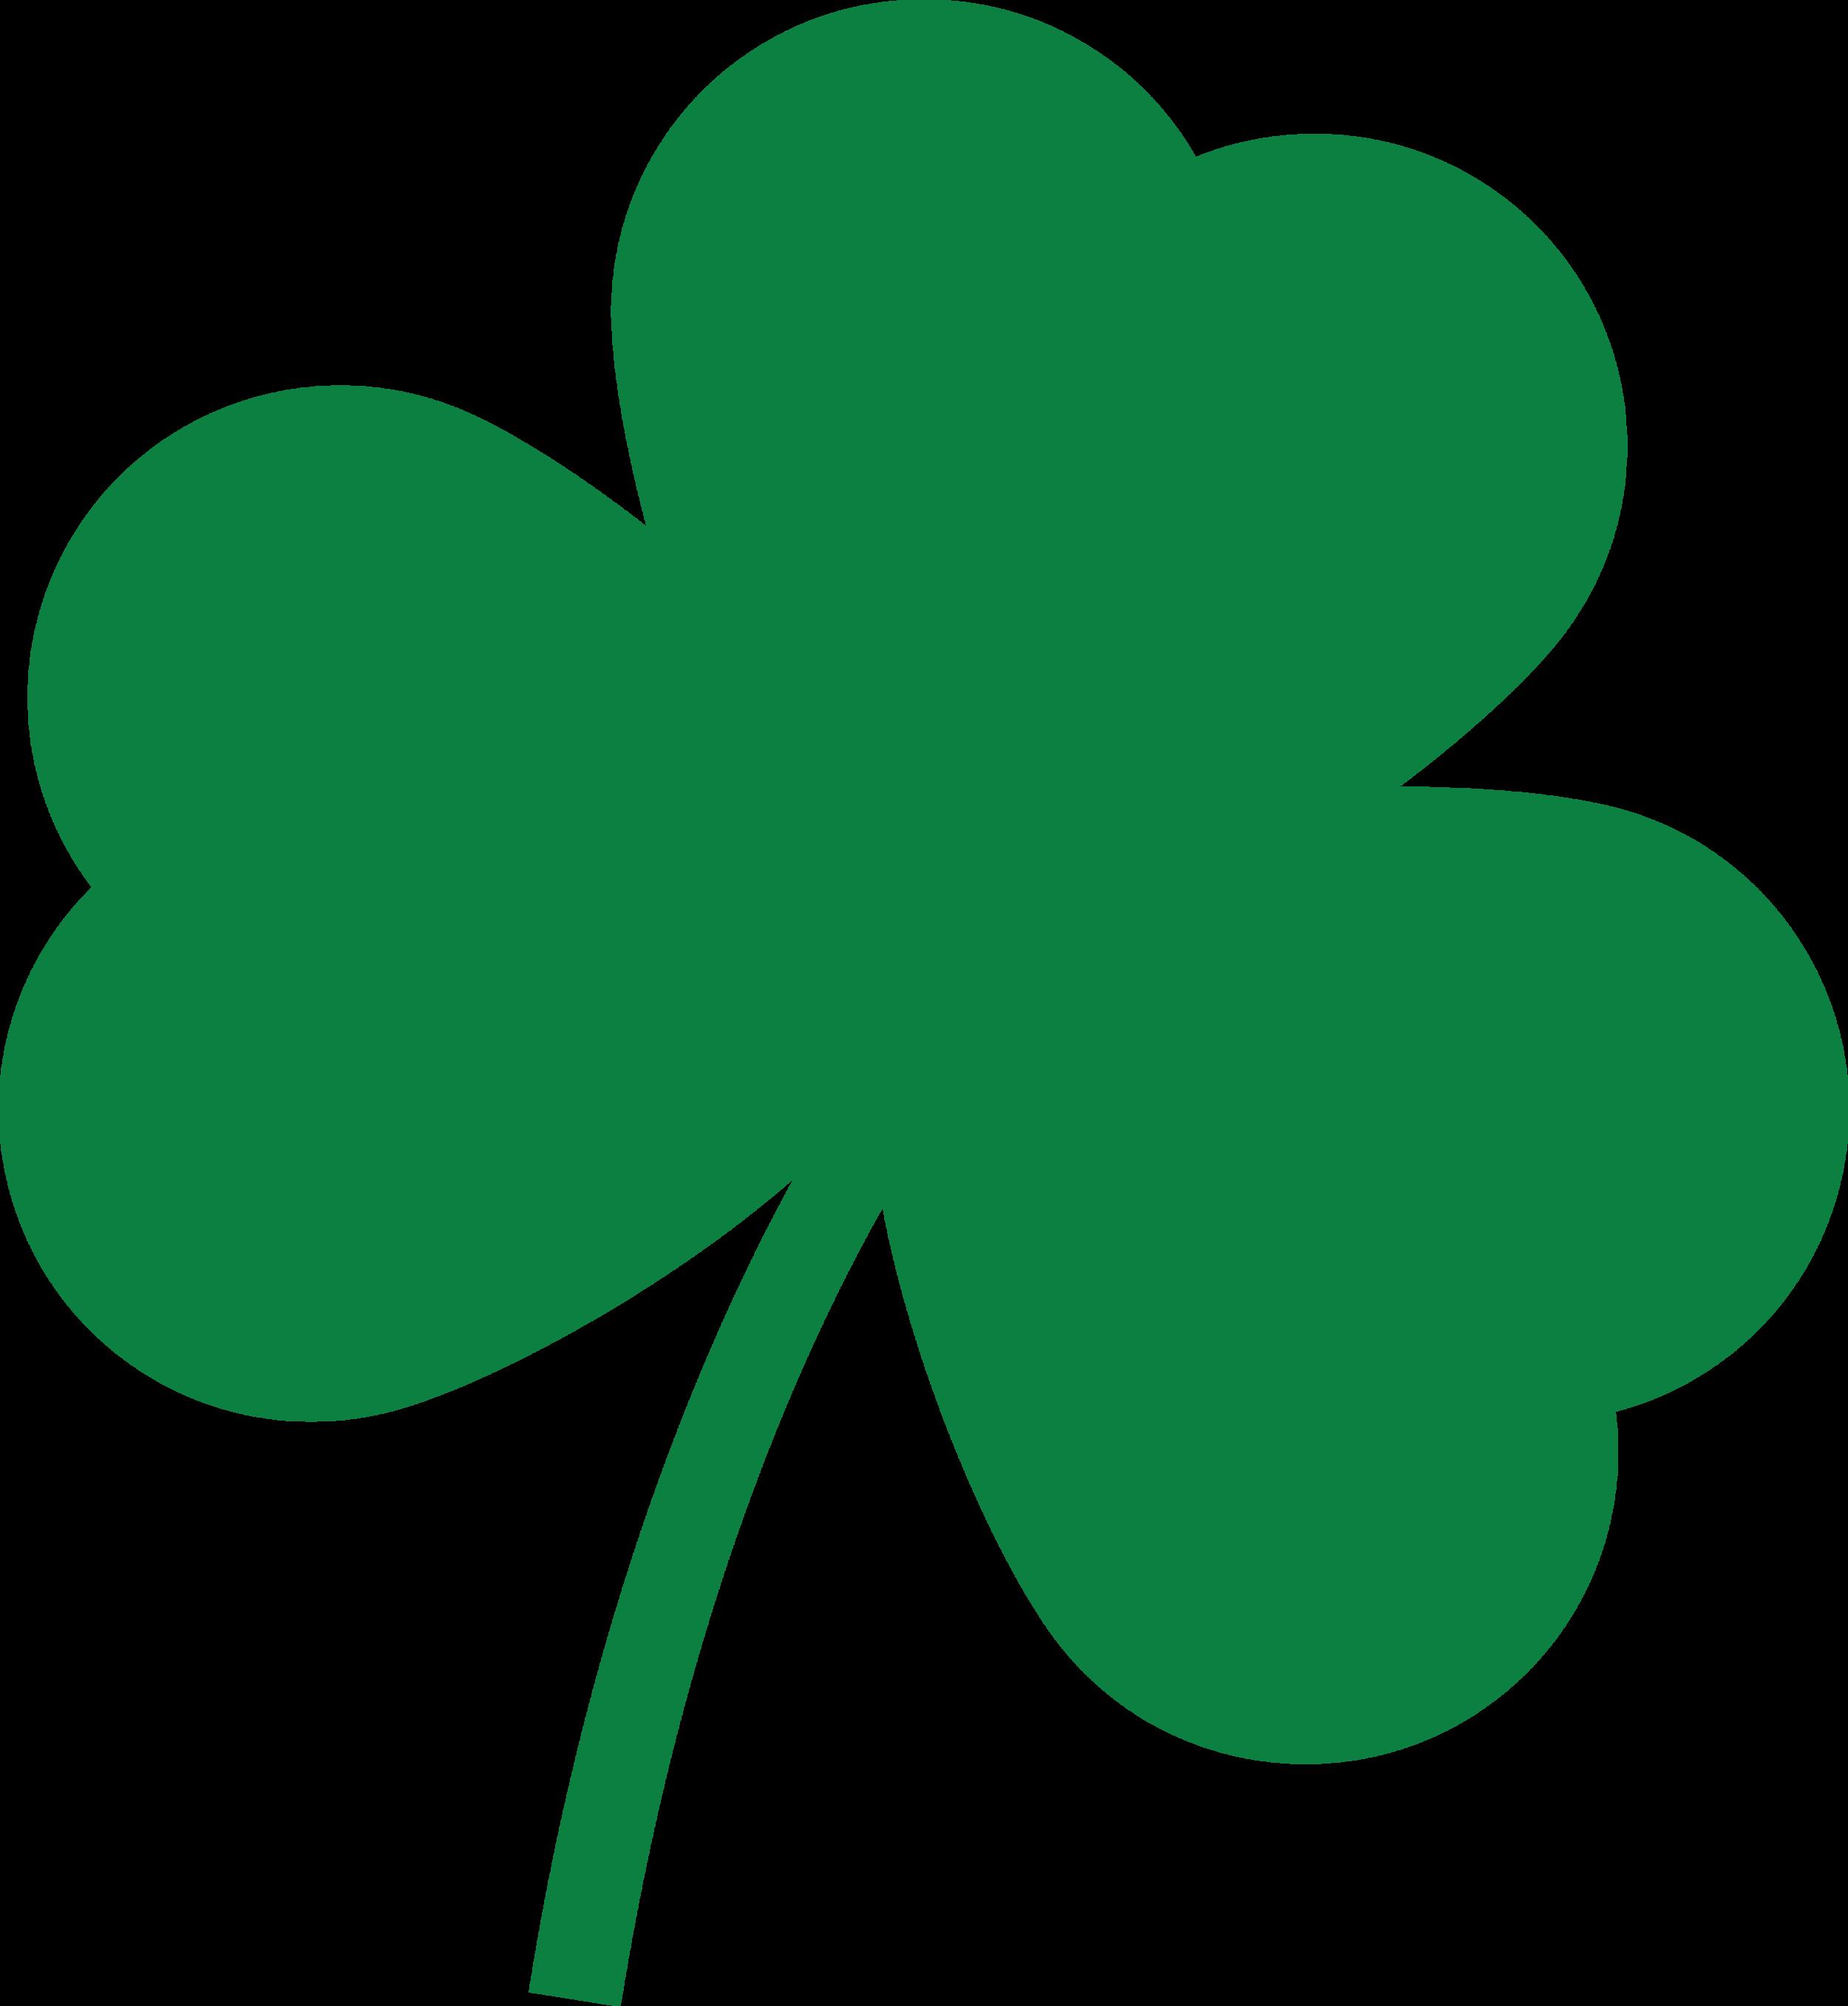 220px-Irish_clover.jpg